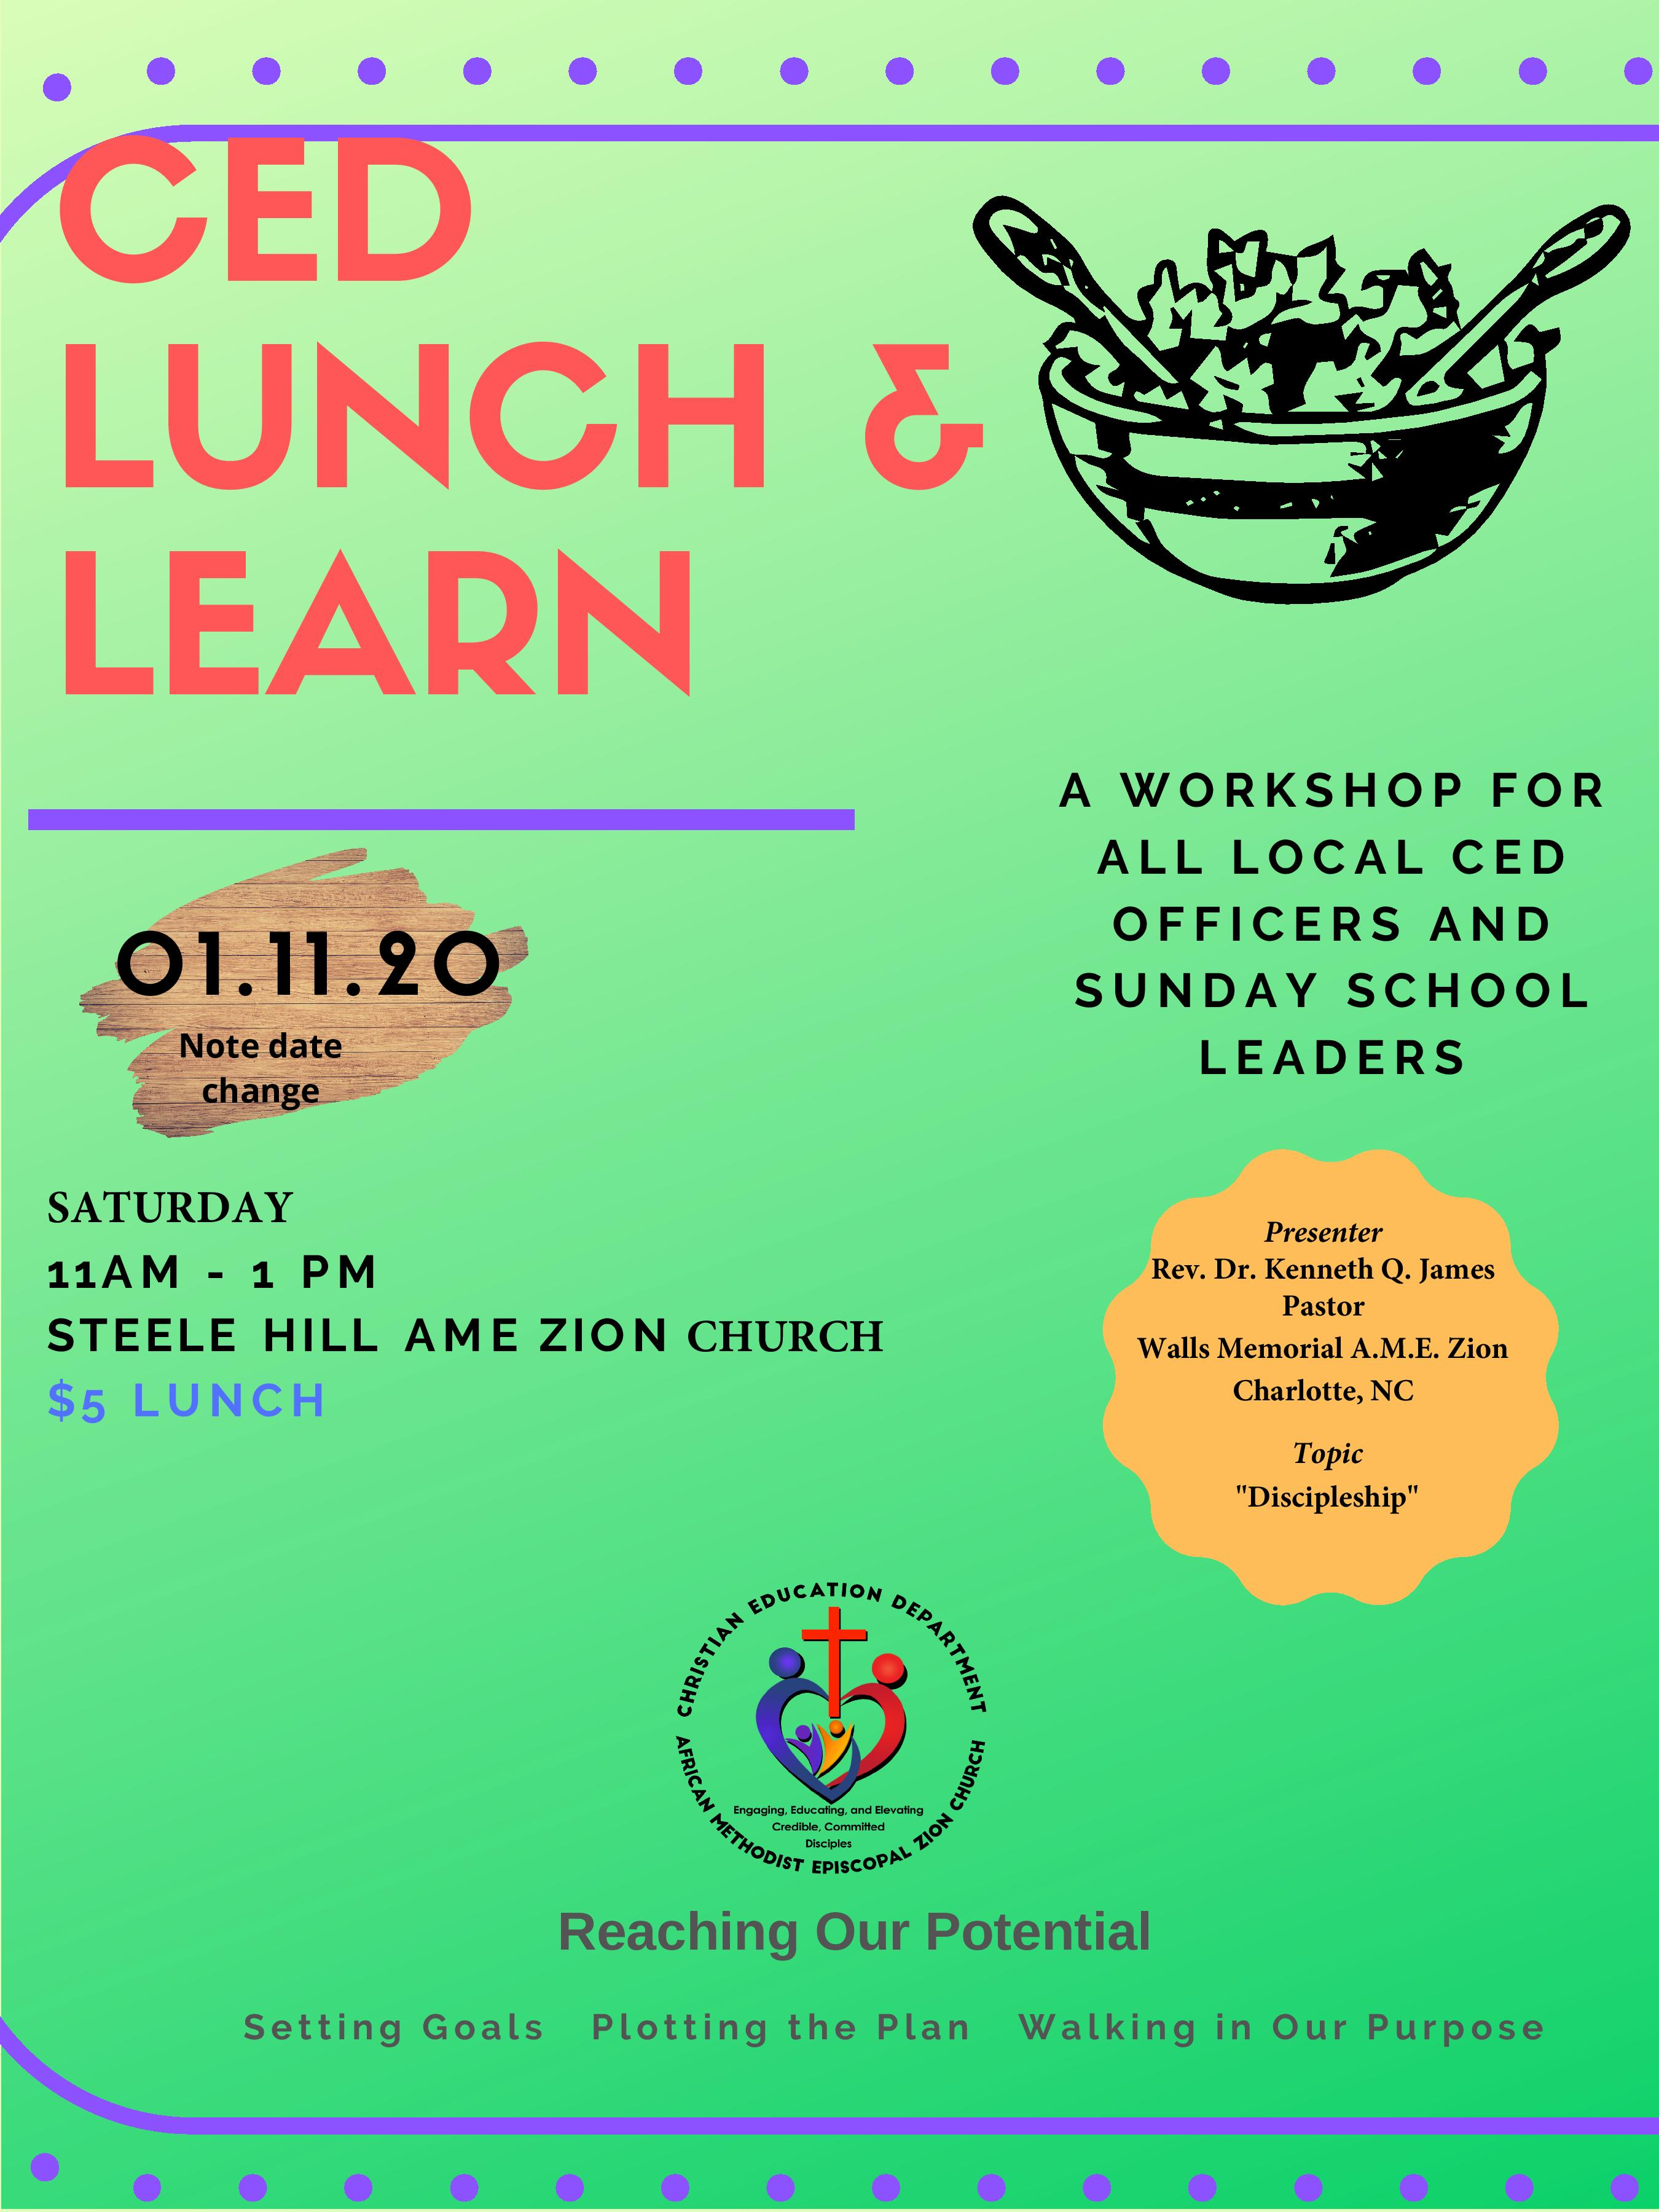 SHCED-Lunch-Learn01112020